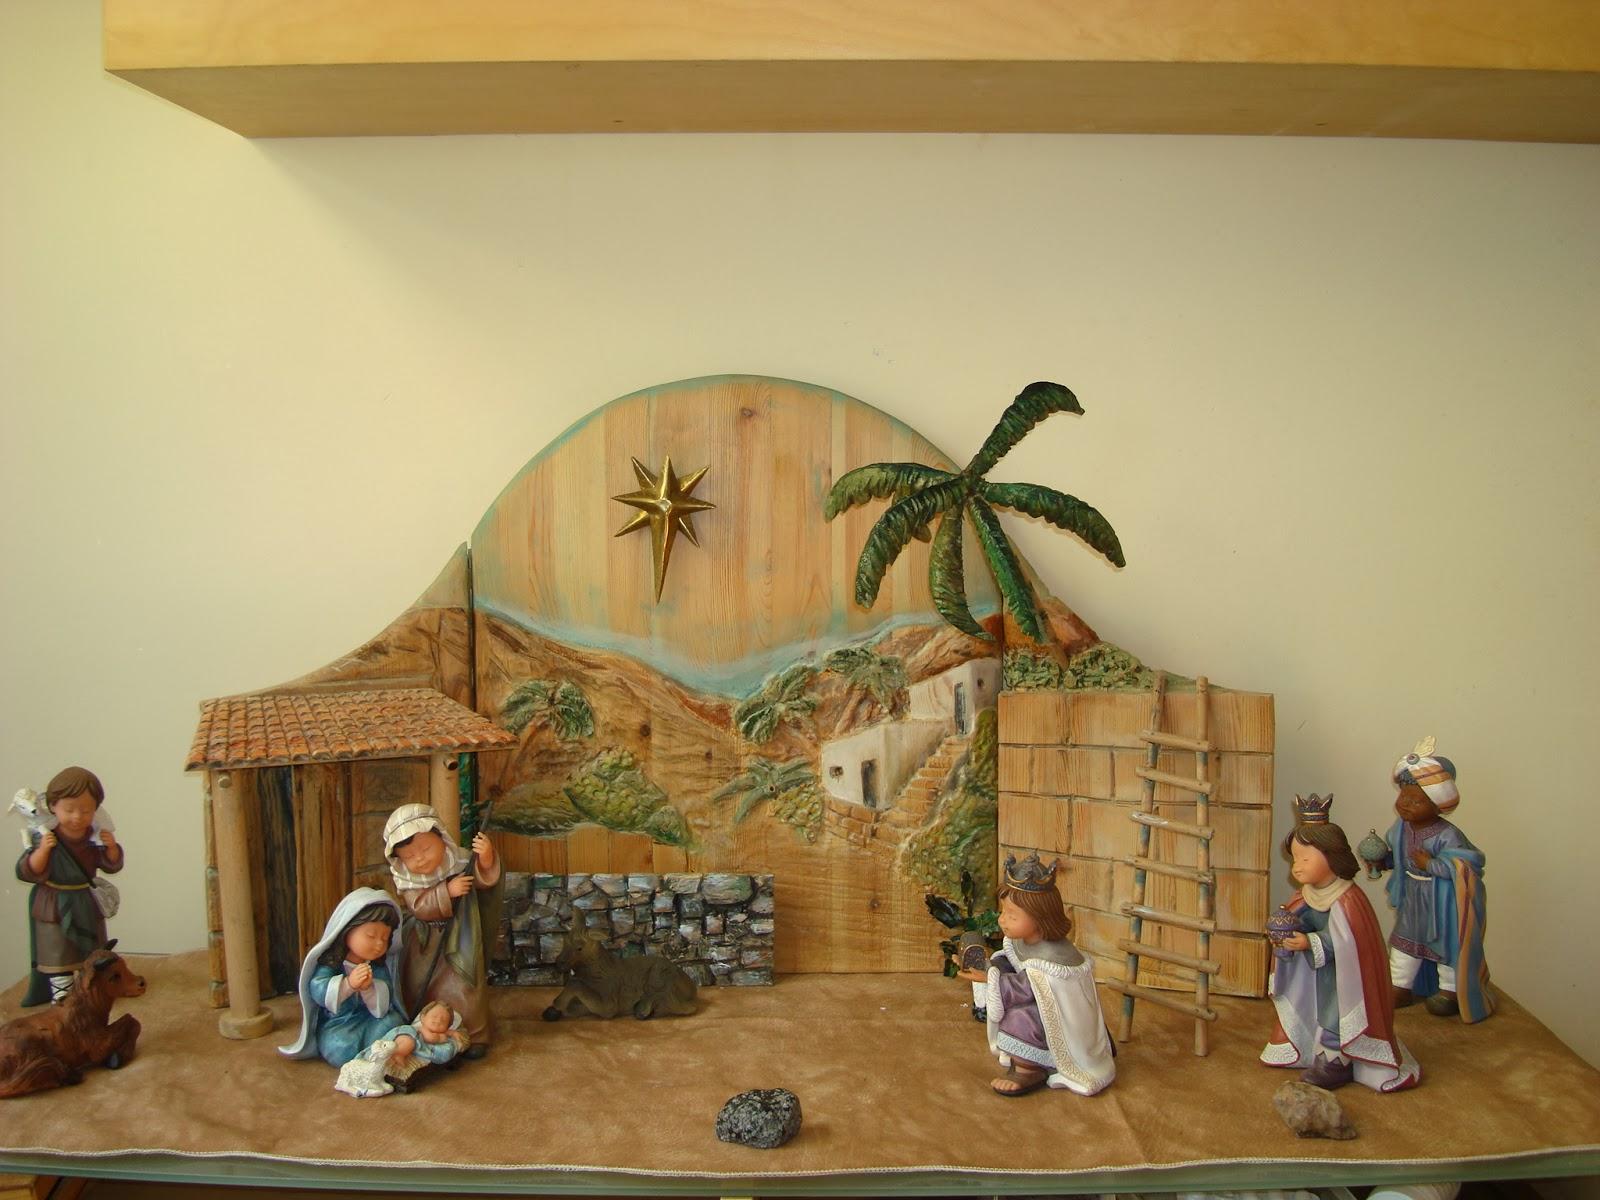 Pablo farrais artesano restaurador de muebles creaci n de - Restaurador de muebles ...